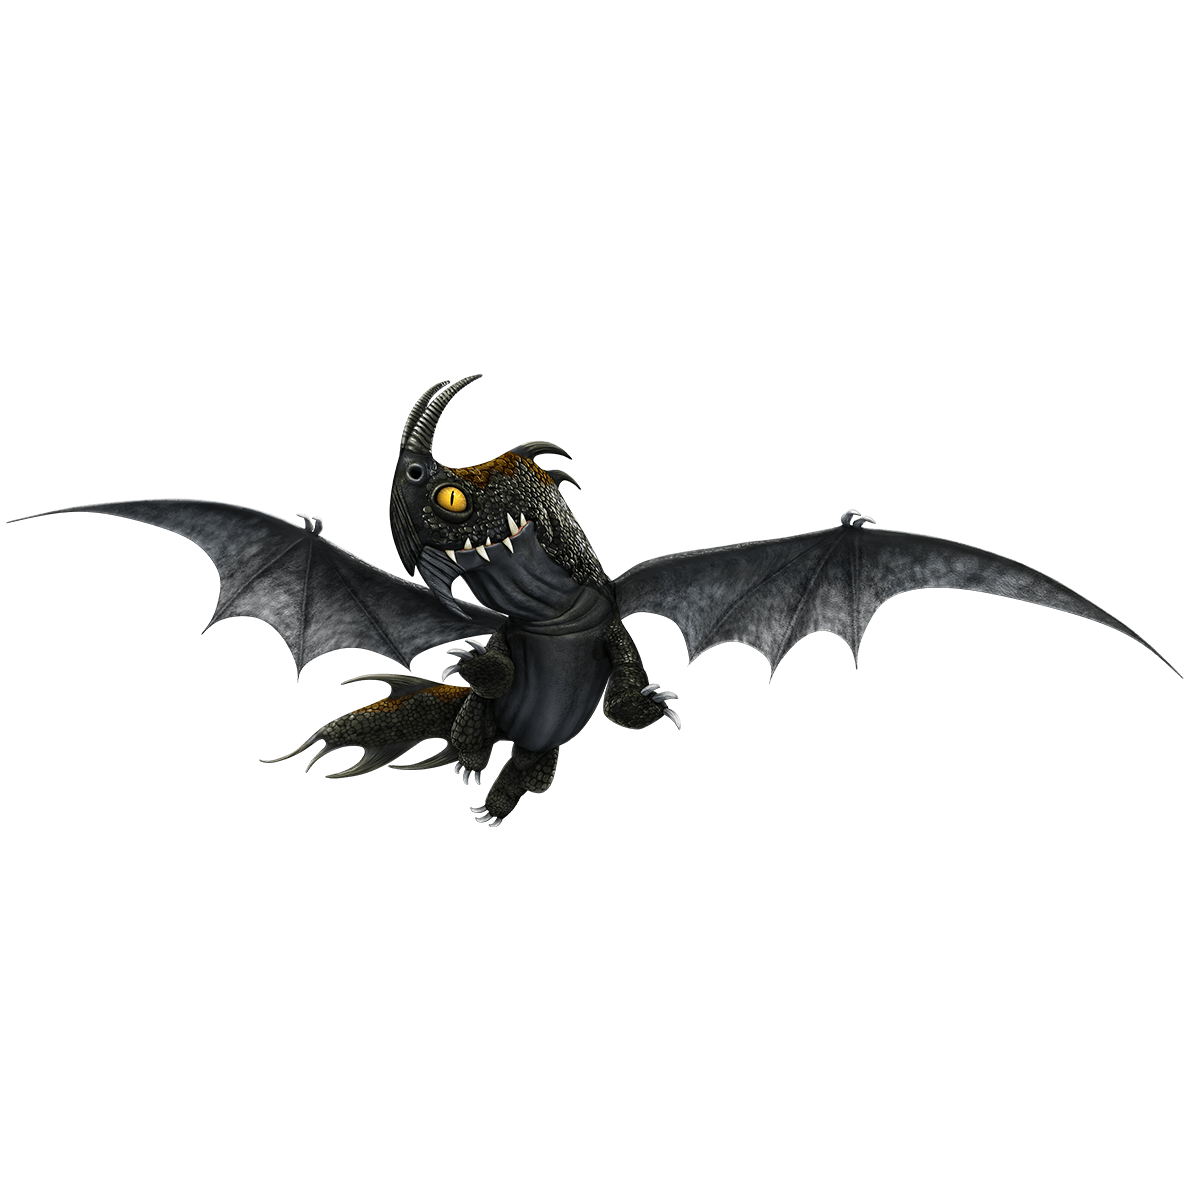 night terror how to train your dragon wiki fandom